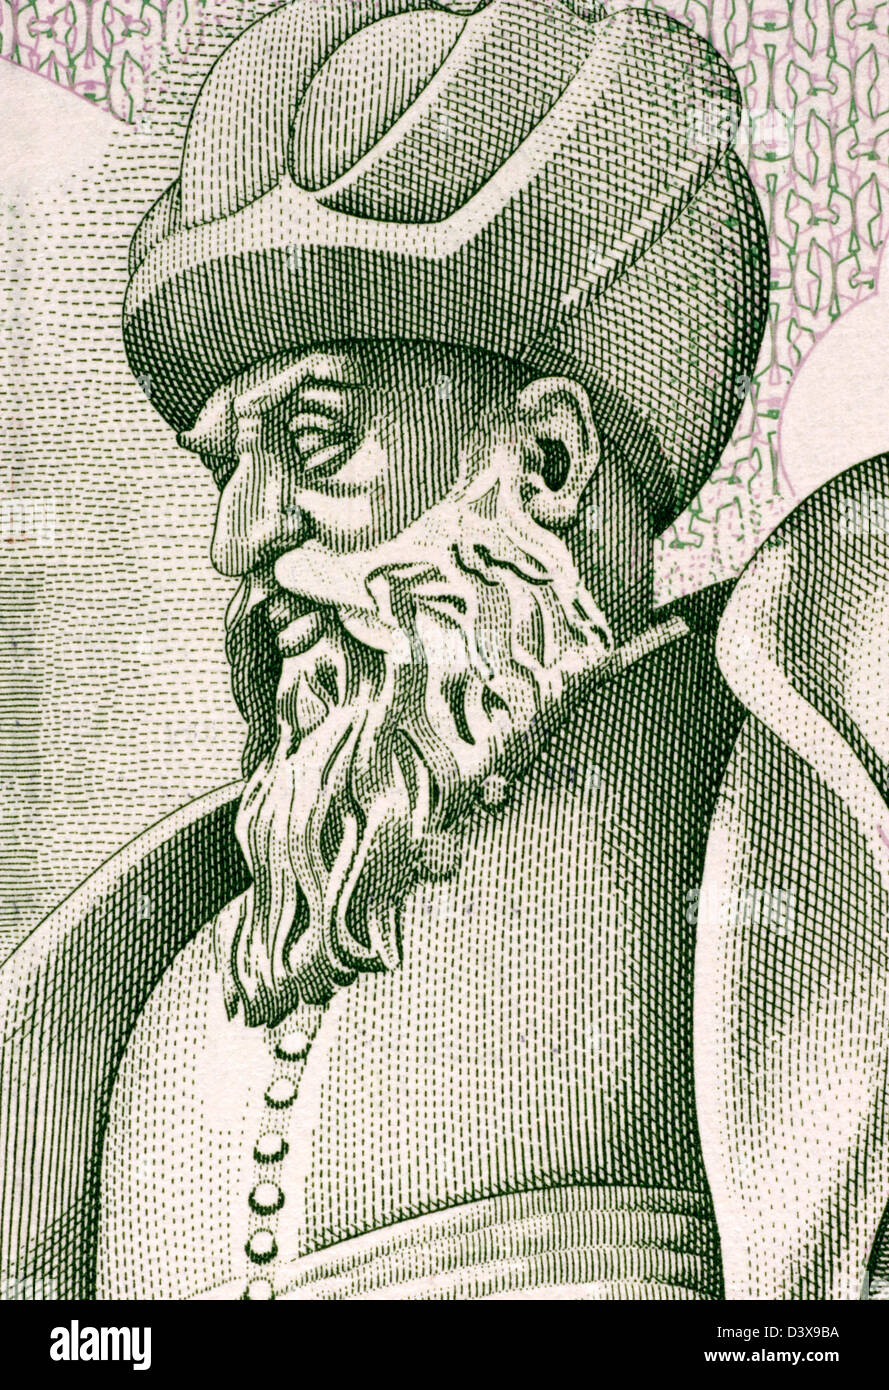 Mimar Sinan (1489-1588) on 10000 Lira 1989 Banknote from Turkey. Ottoman architect and civil engineer. - Stock Image